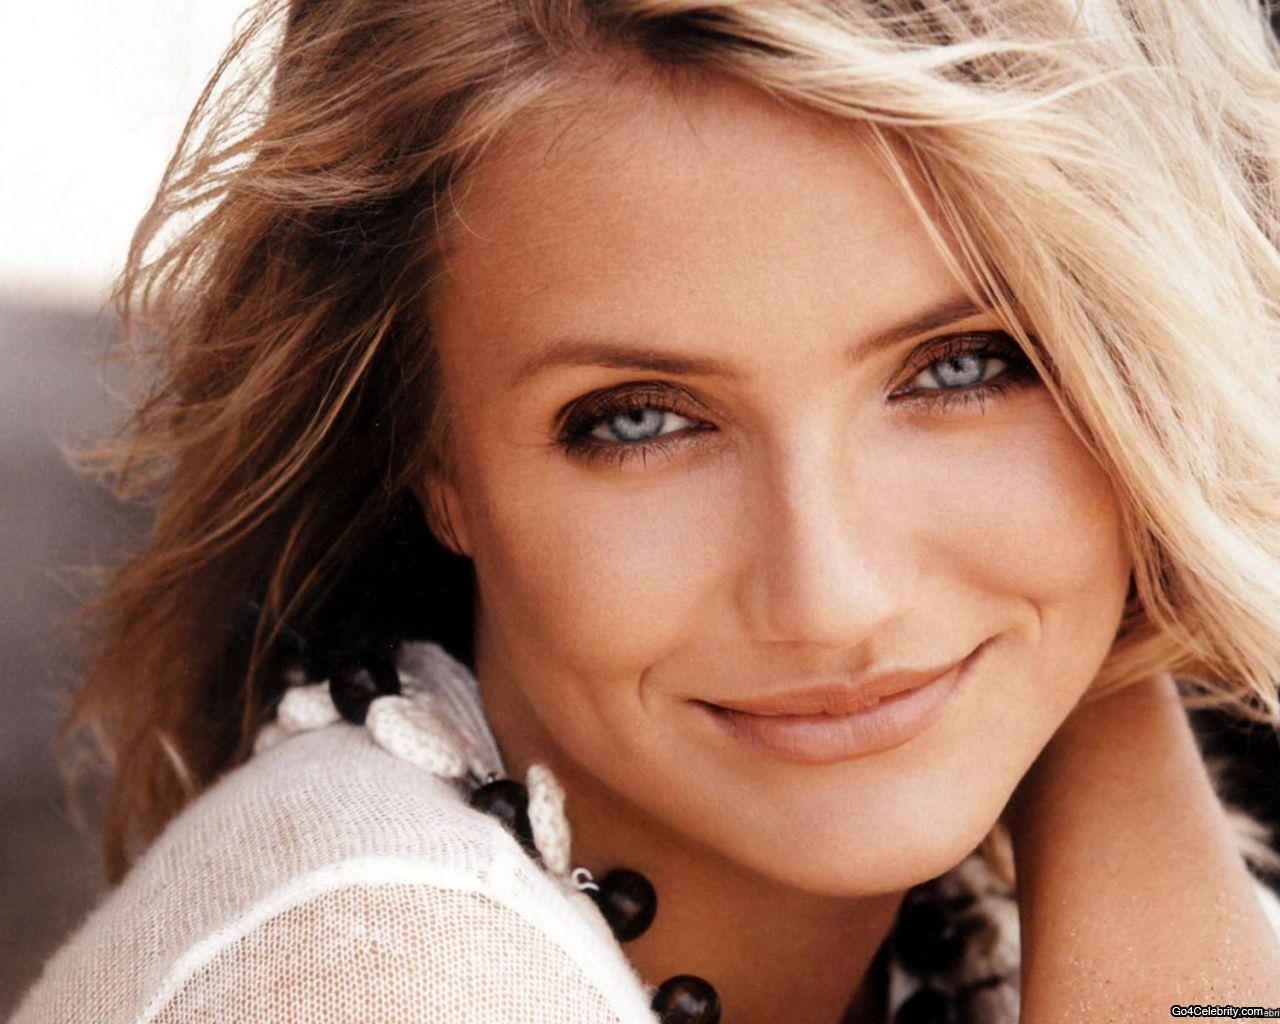 http://2.bp.blogspot.com/-hzANeSZPNfo/T2NumPPQoBI/AAAAAAAAGog/r-3KBjZBXS8/s1600/dralive-Cameron-Diaz-linda-preciosa-actriz.jpg